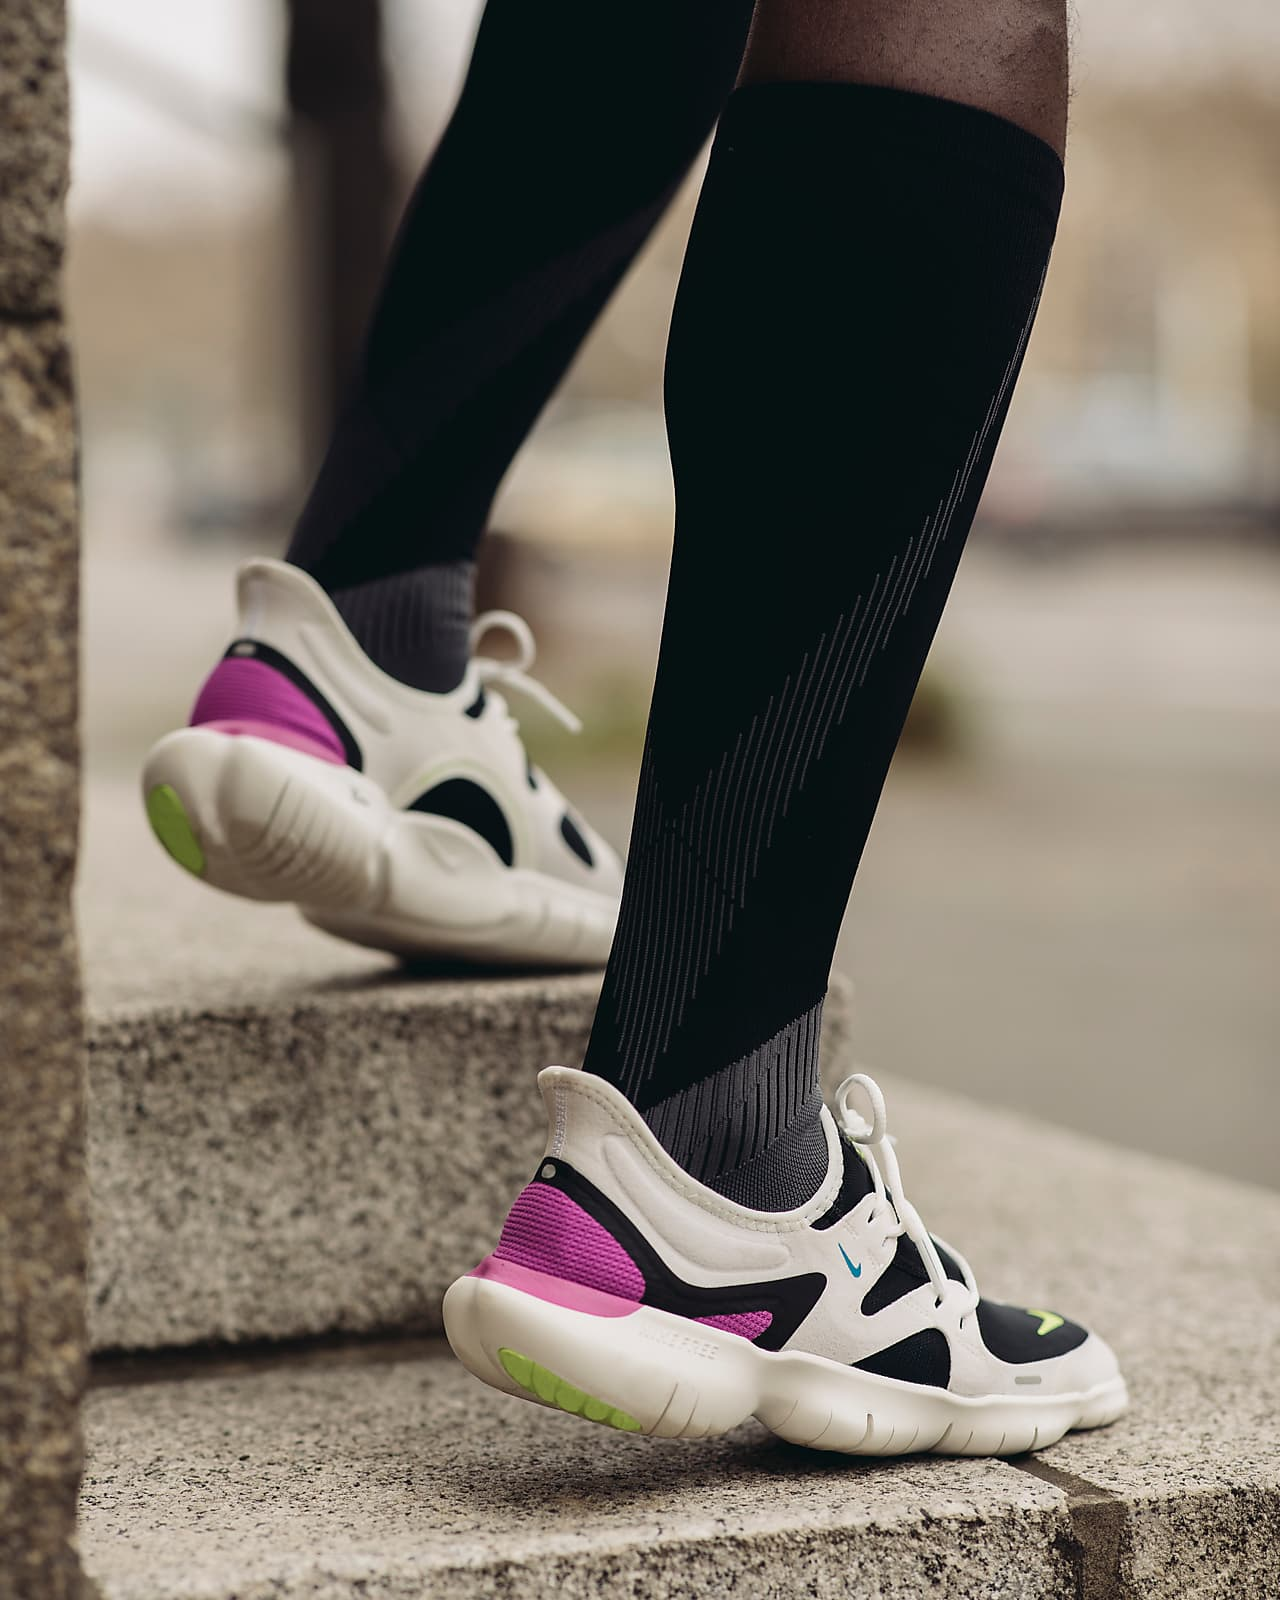 zoo Tener cuidado discordia  Nike Free RN 5.0 Men's Running Shoe. Nike IN